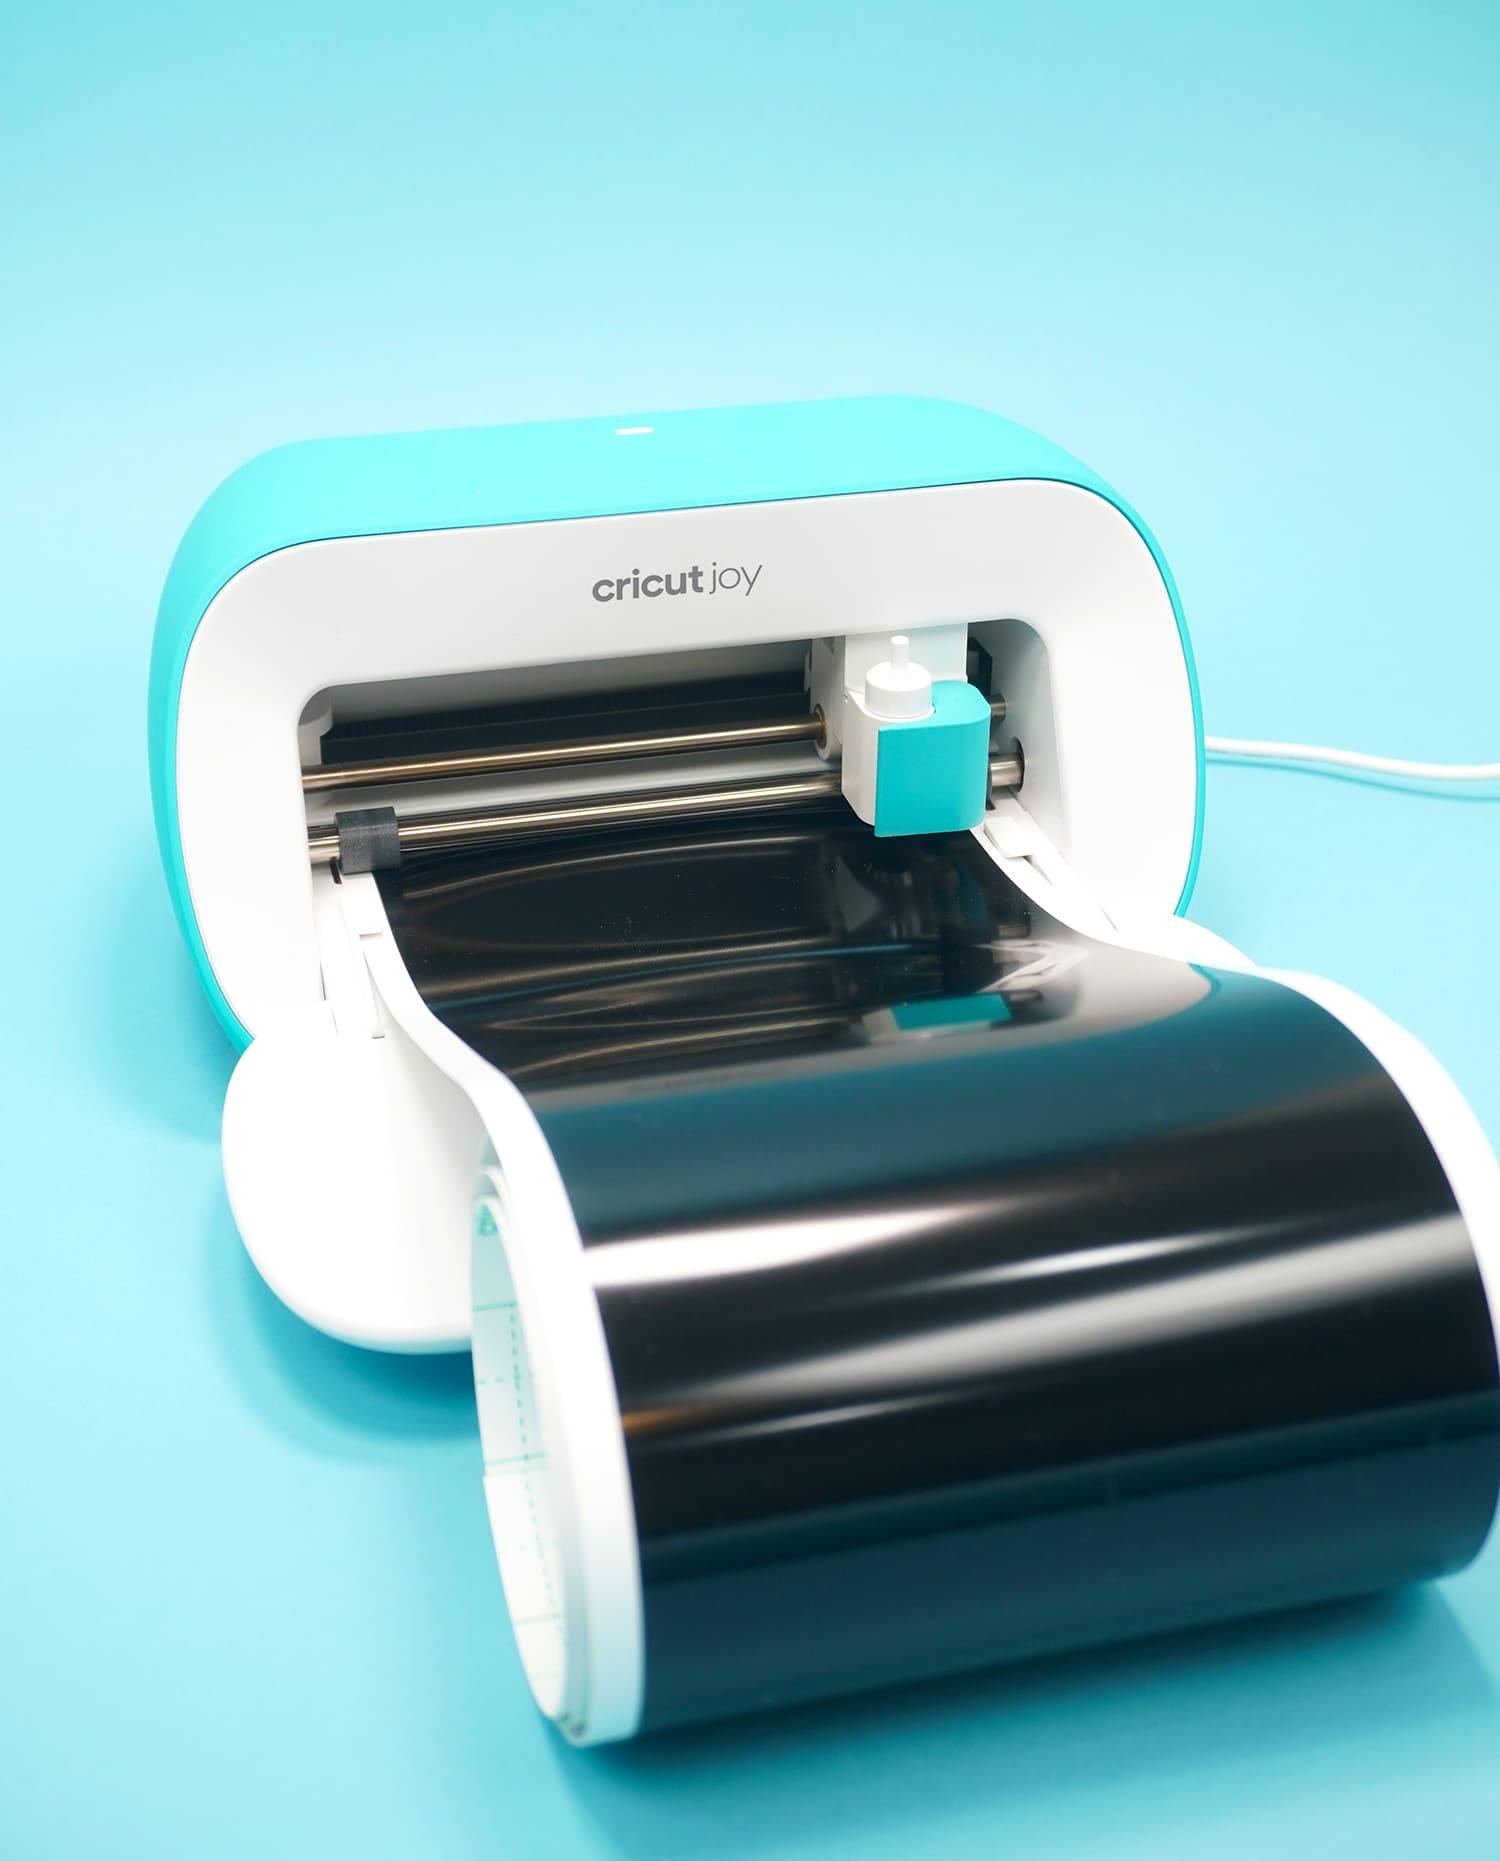 Cricut Joy machine loaded with black Smart Vinyl on blue background